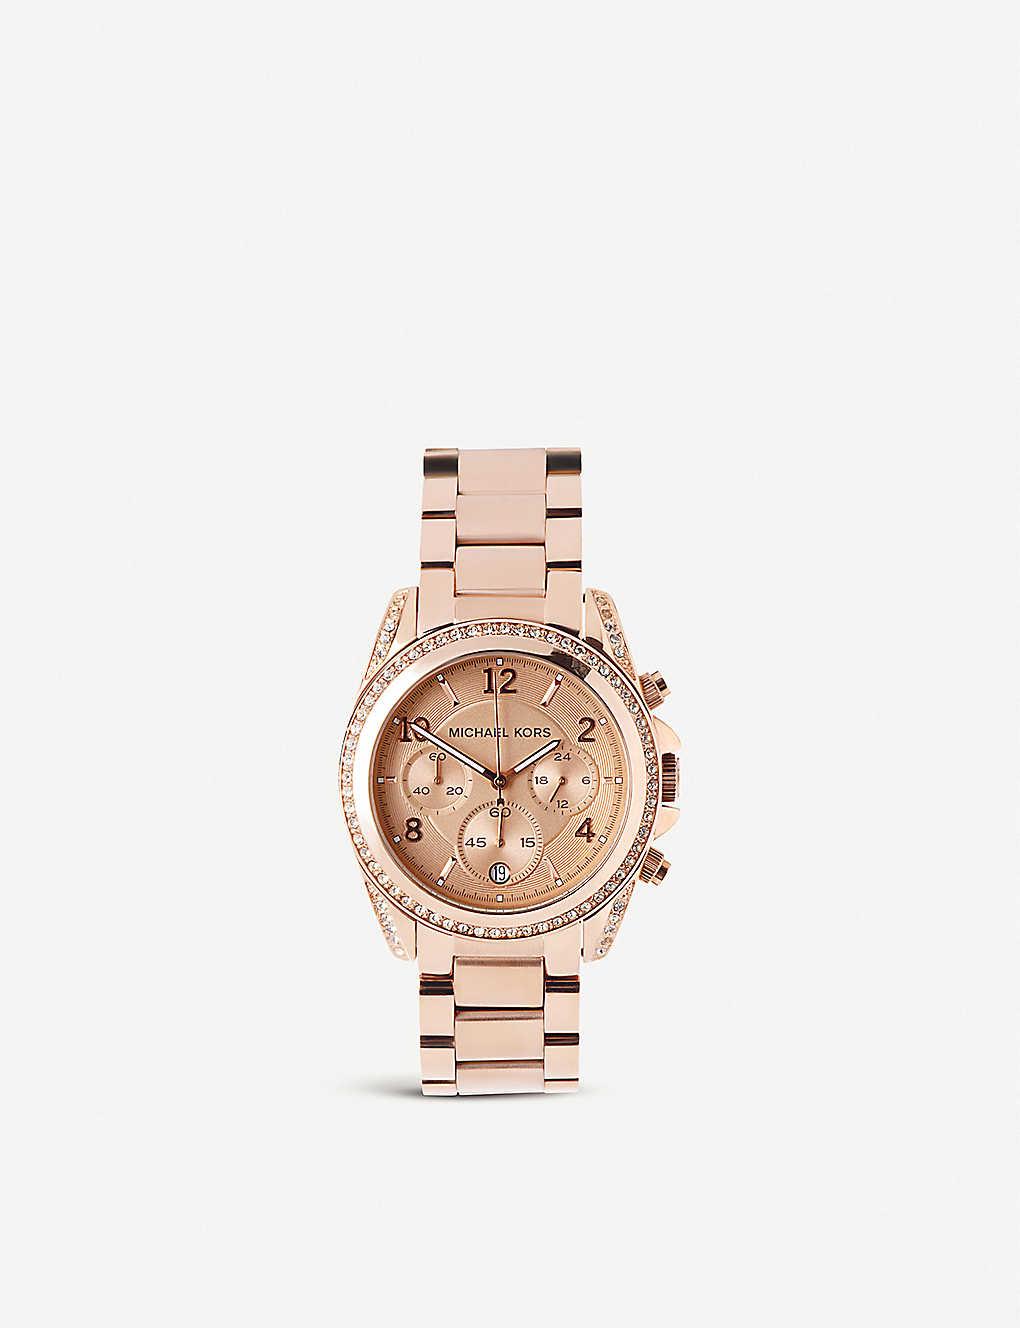 b6955962bba9 MICHAEL KORS - MK5263 Blair rose gold-plated watch